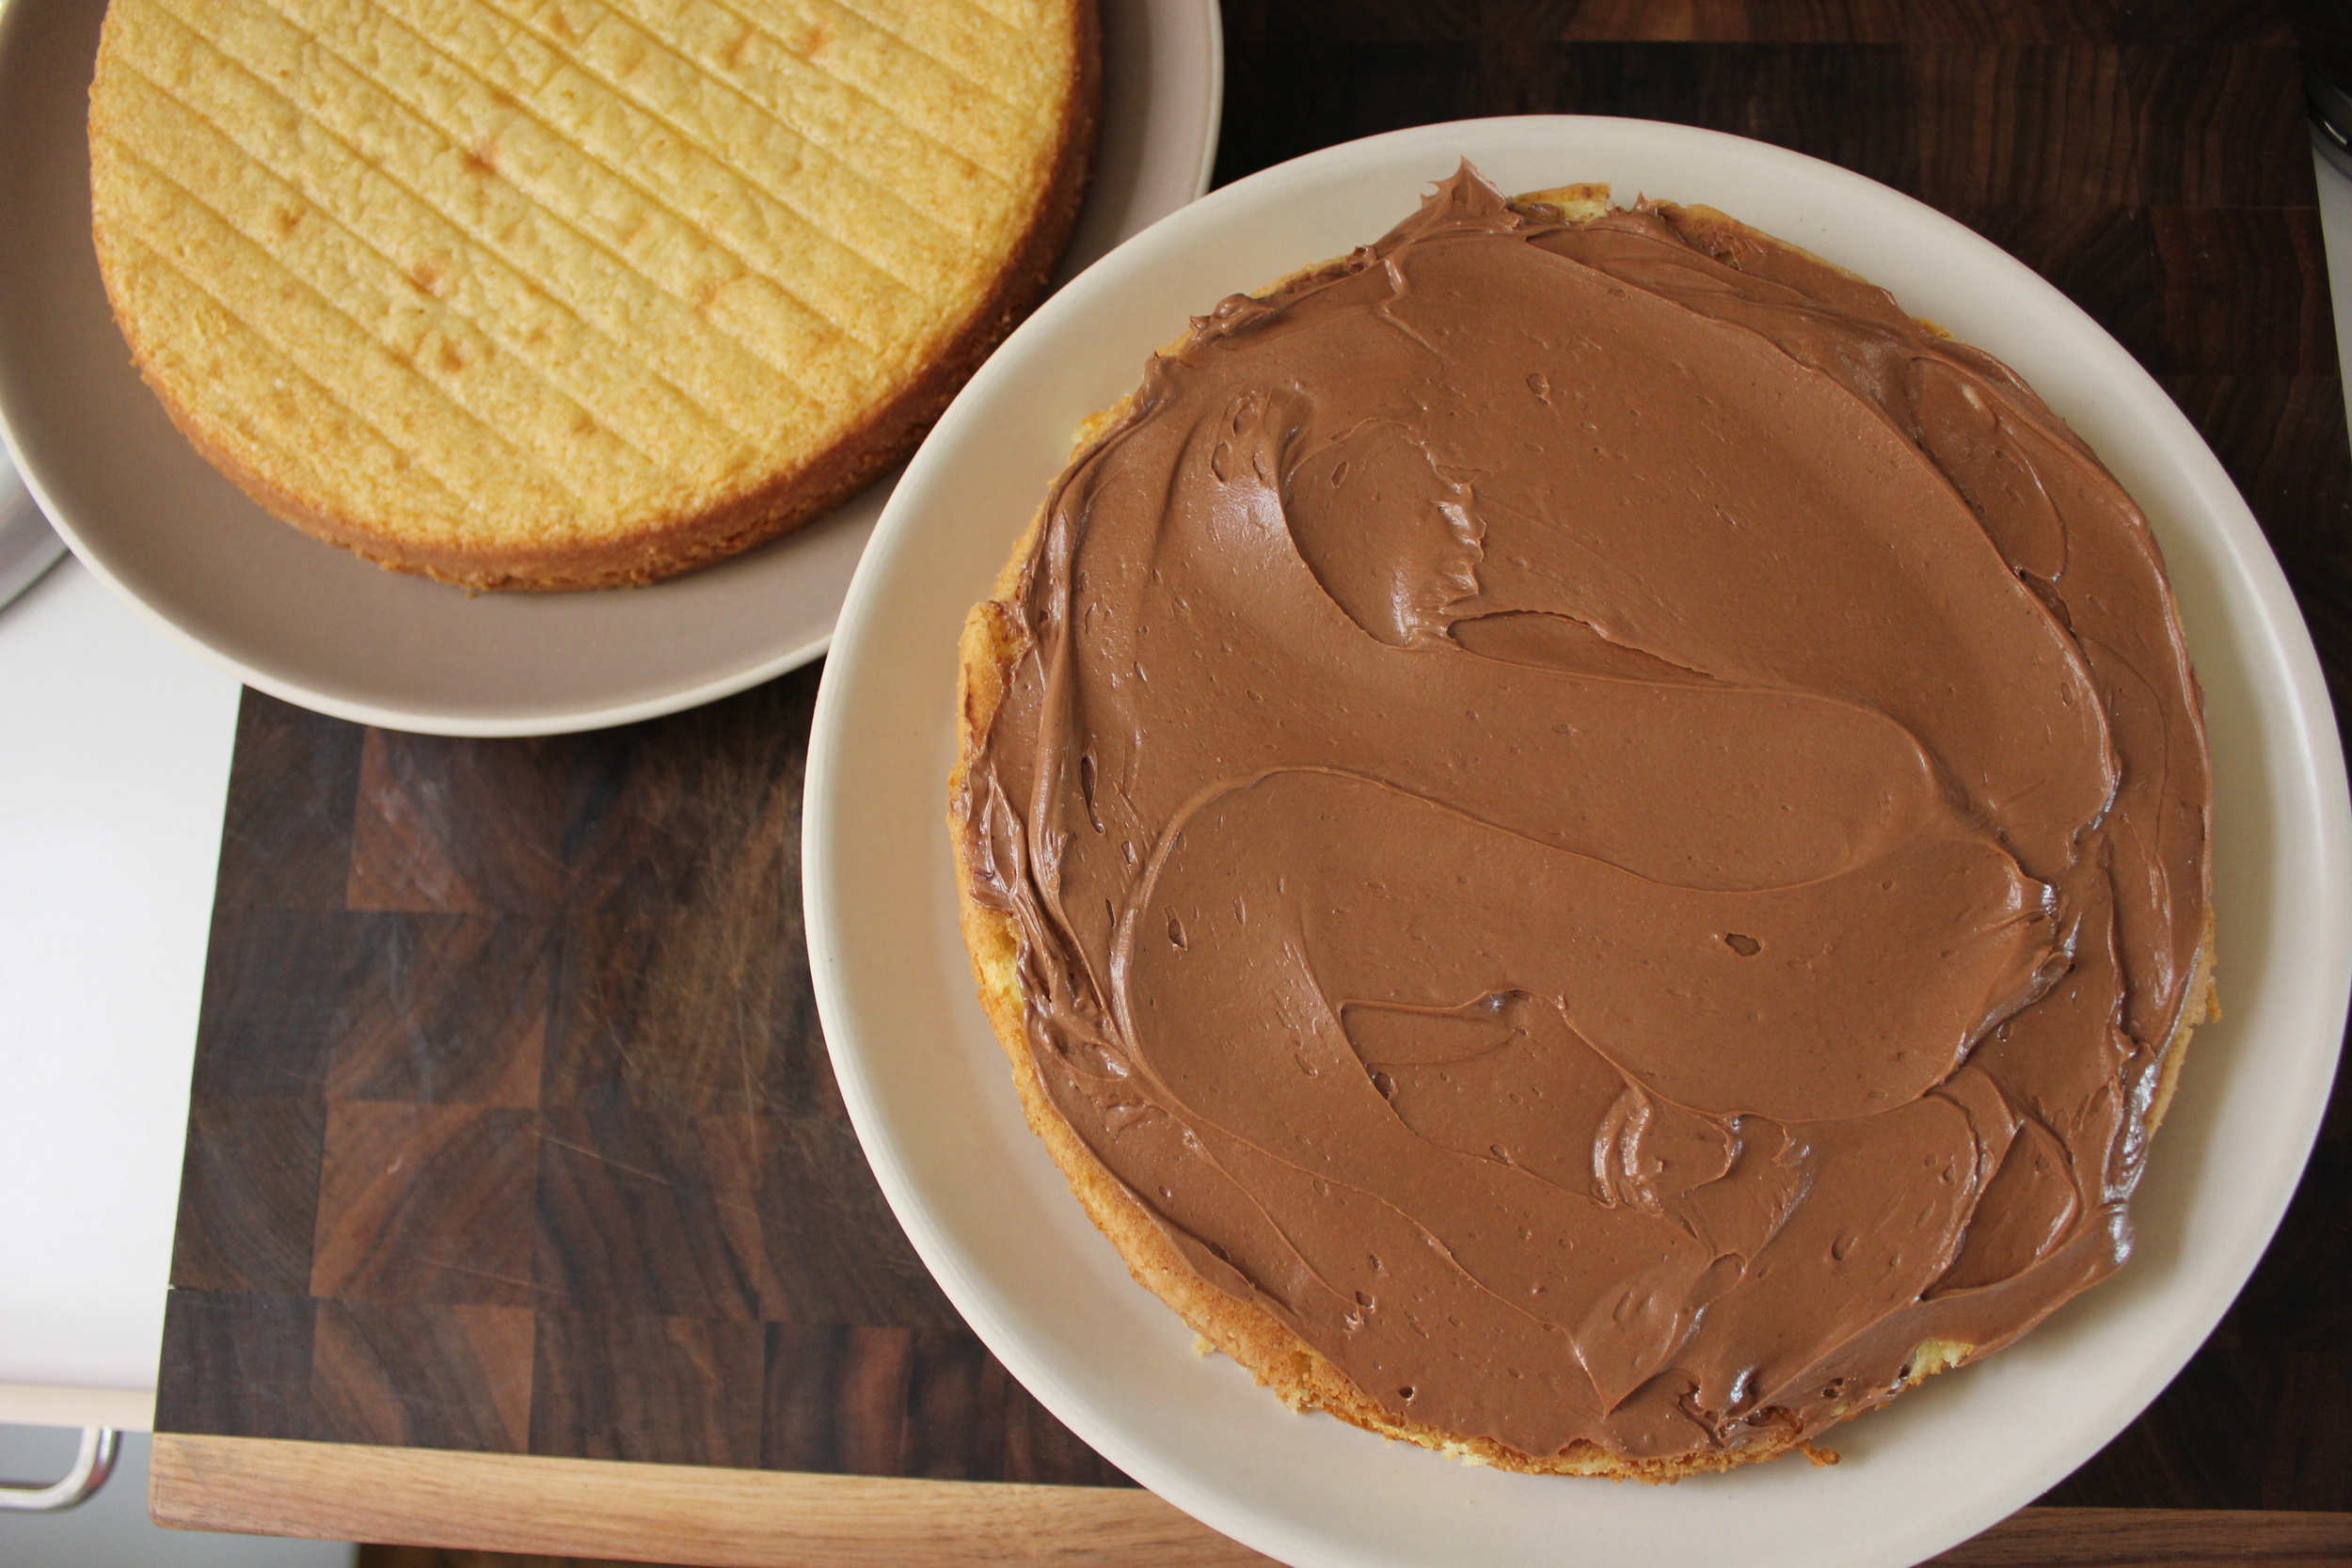 Classic yellow cake with chocolate frosting #dessert #BarefootContessa - www.fancycasual.com